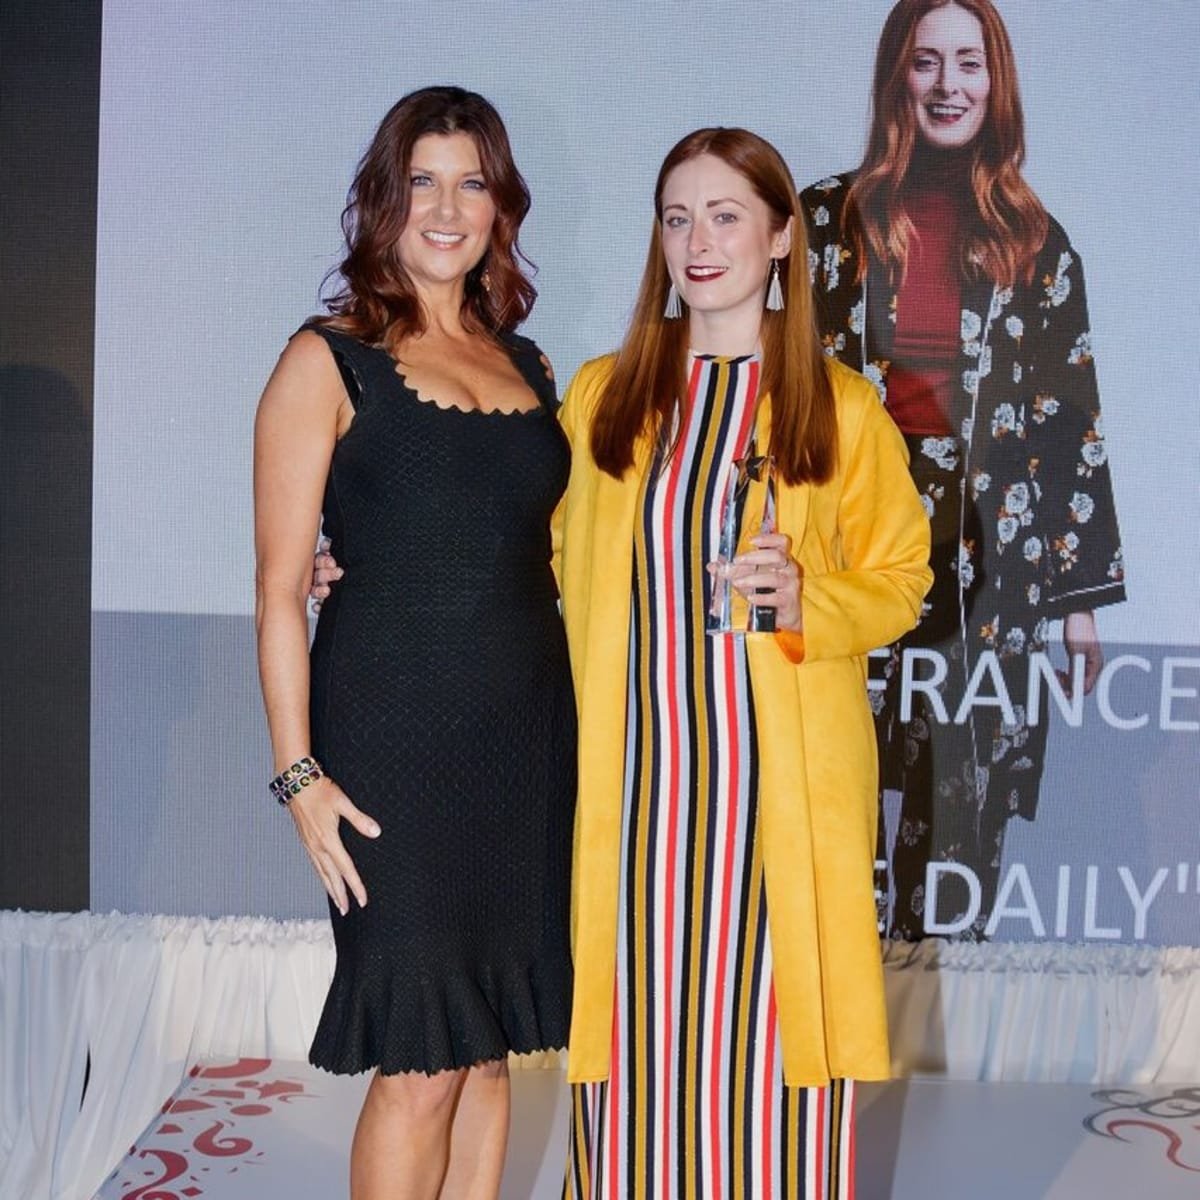 Cynthia Smooth, Amber LaFrance, FGI Rising Star